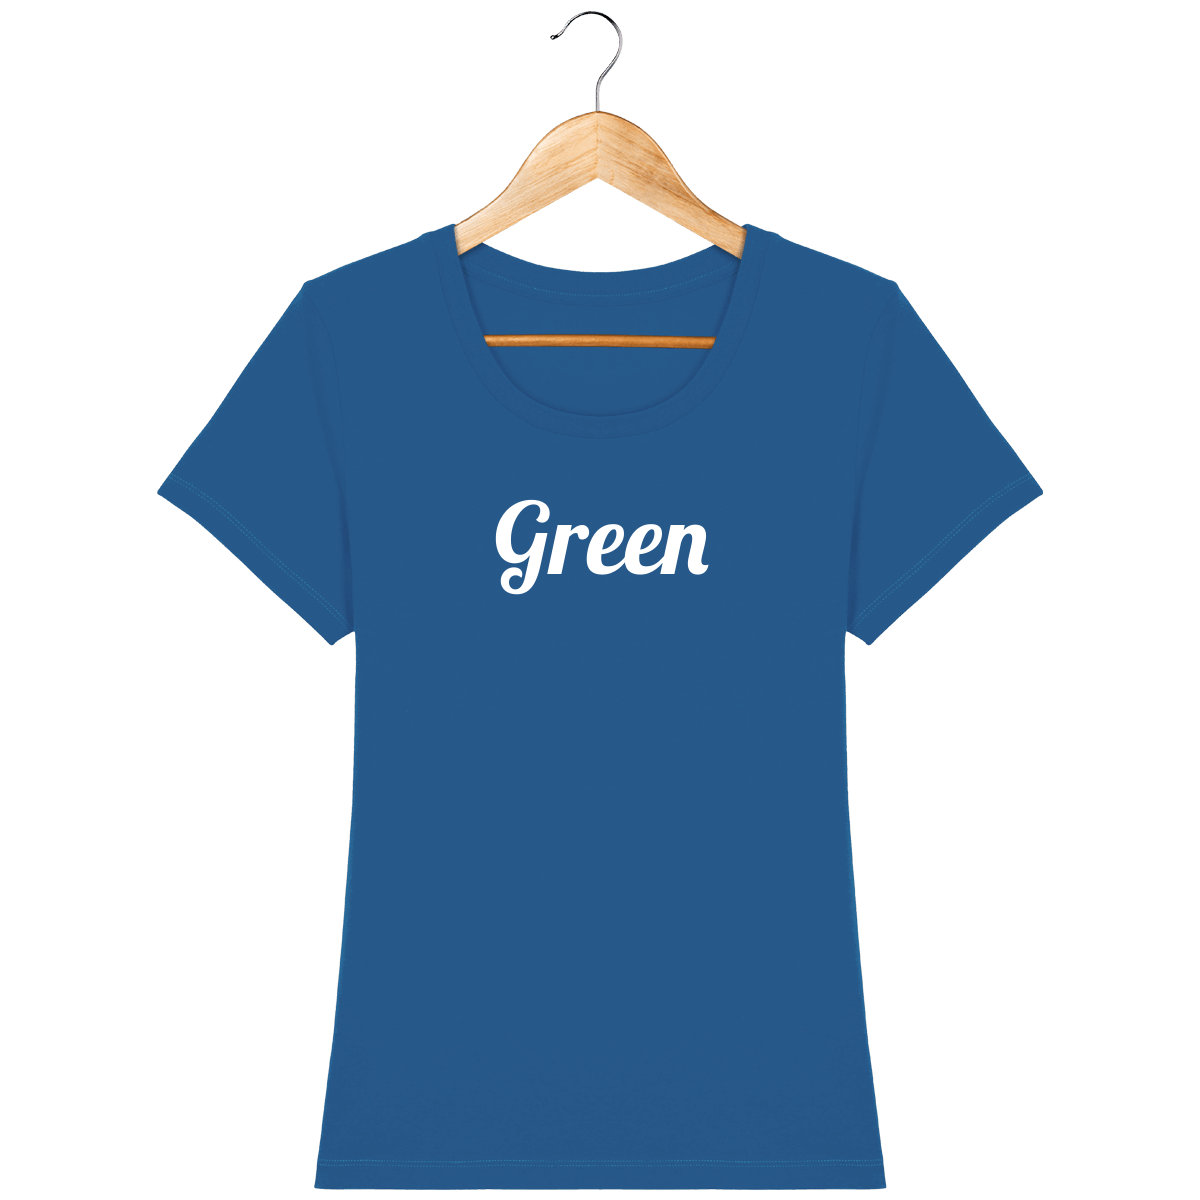 t-shirt-bio-brode-green-khaki-white_royal-blue_face